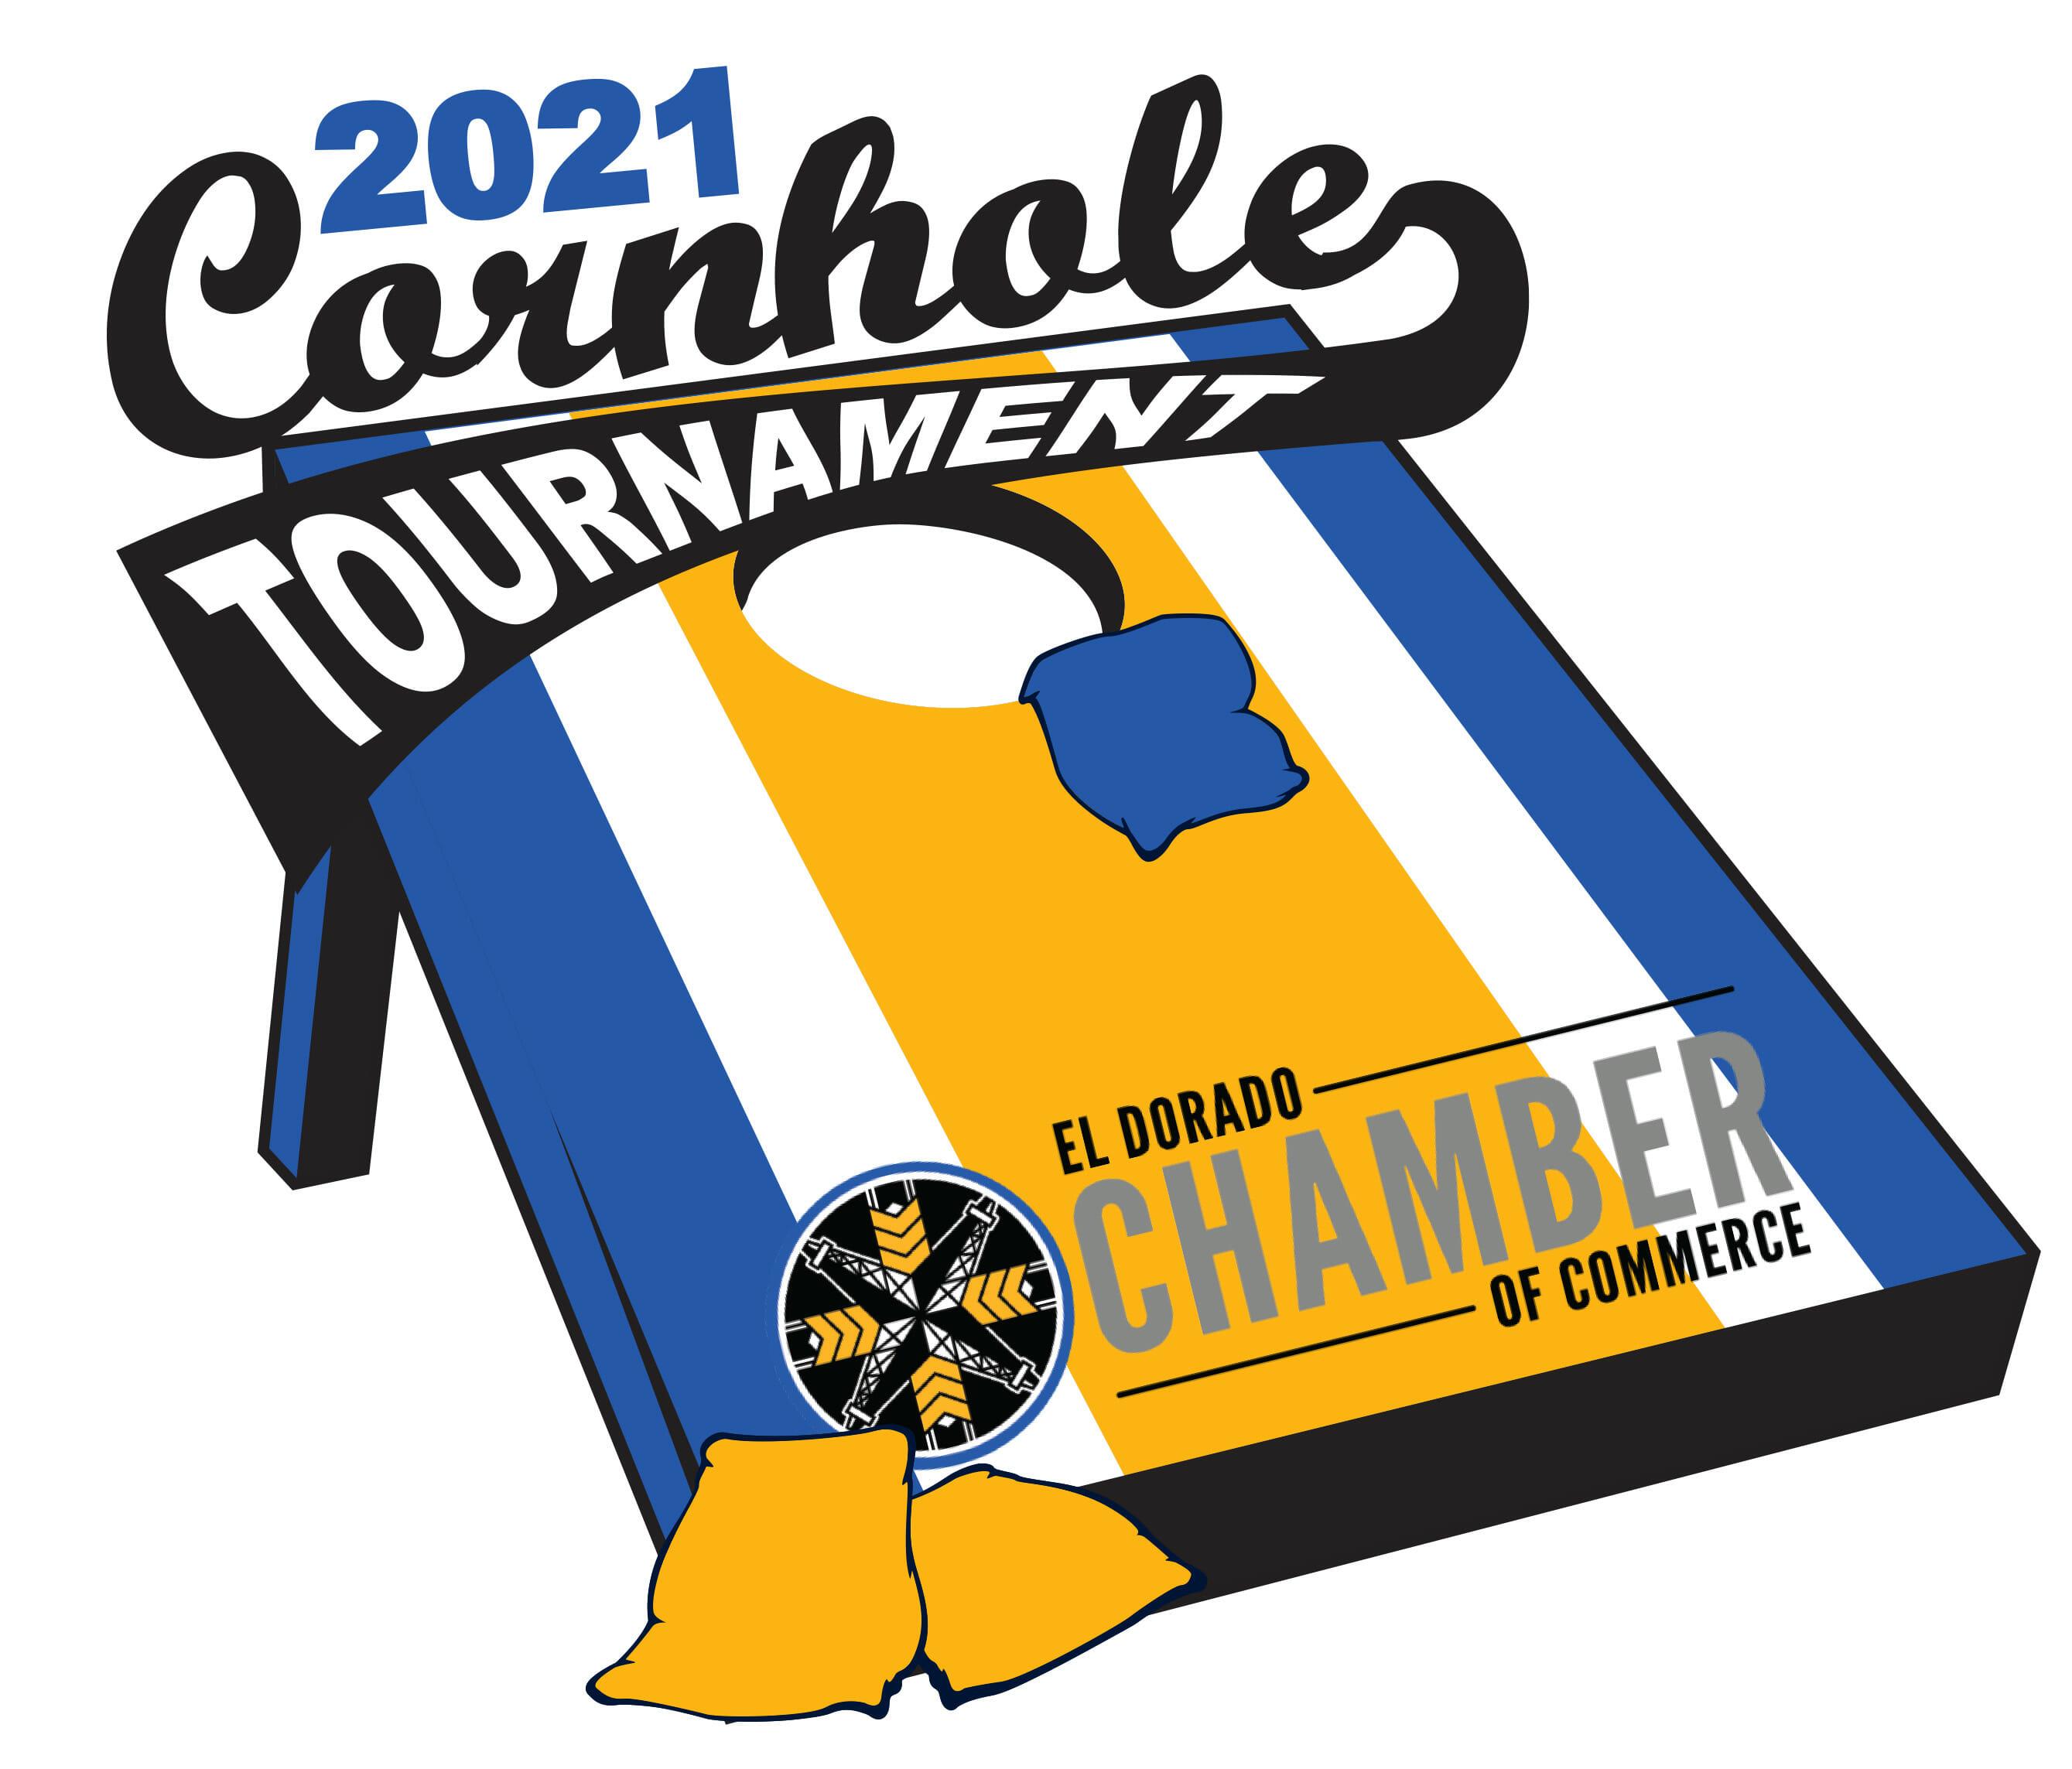 Cornhole tournament logo for print